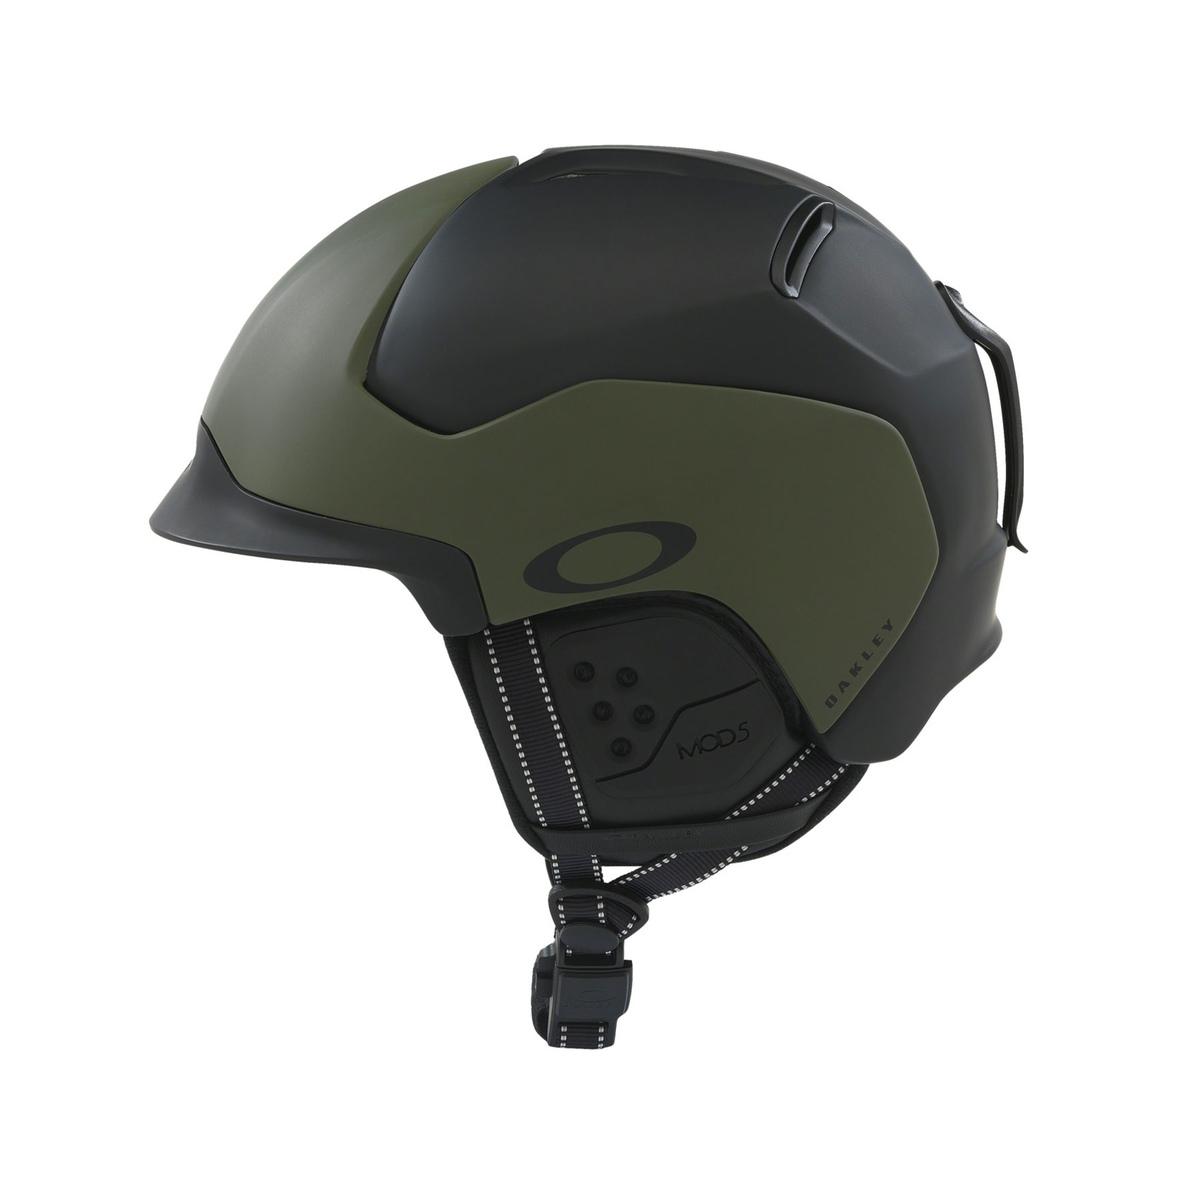 Prezzi Oakley casco mod 5